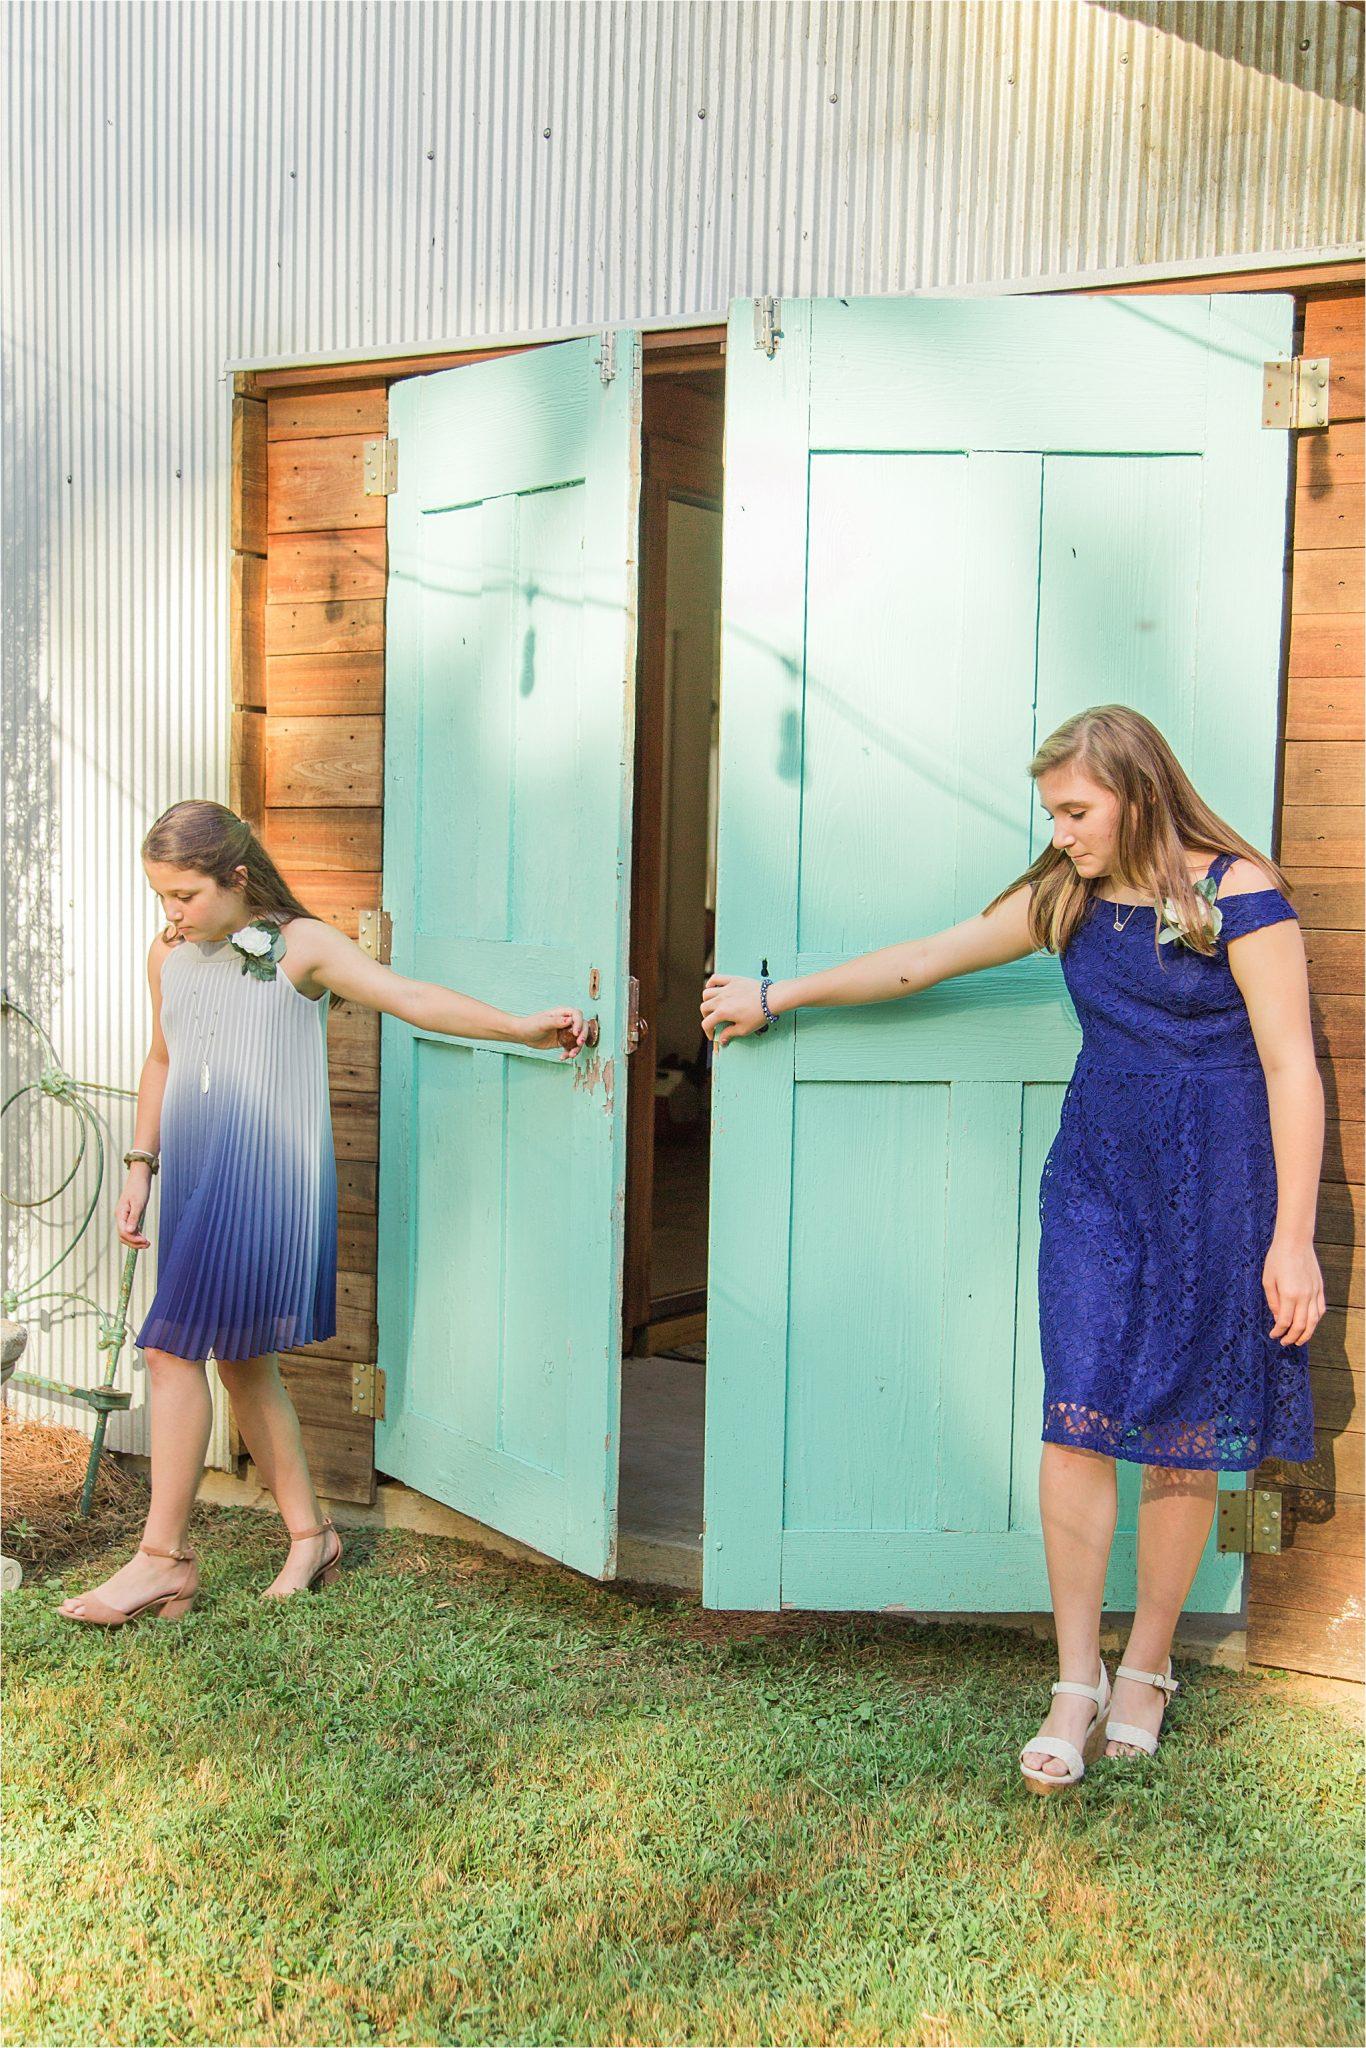 bridal-entrance-special-wedding-ceremony-blue-wedding-barn-doors